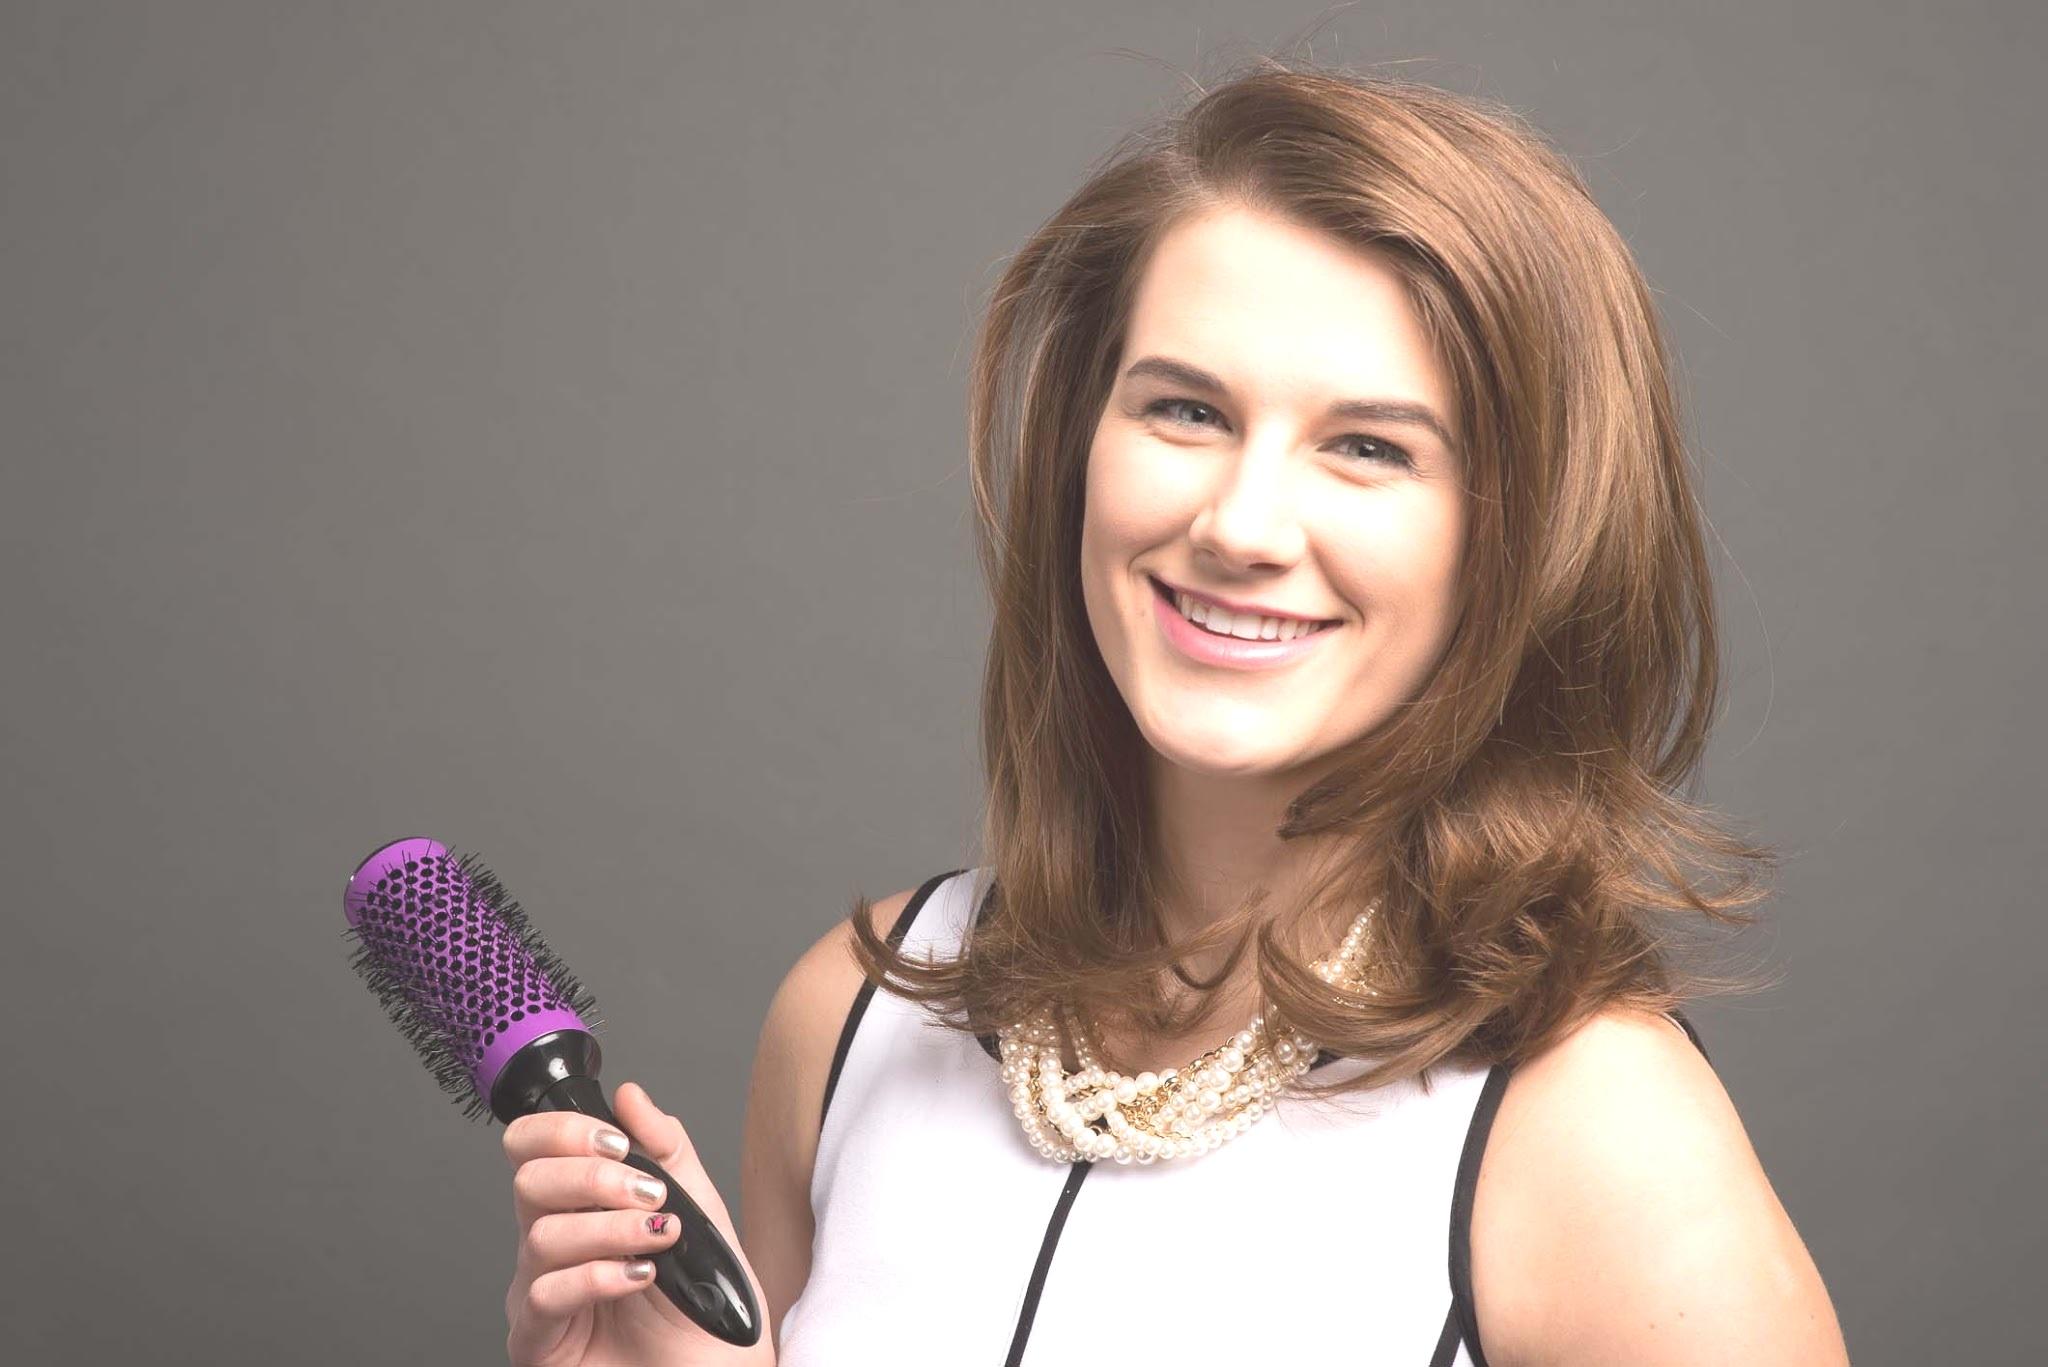 Megan Marketing Assistant Brand Manager Assistant Click n Curl hair model